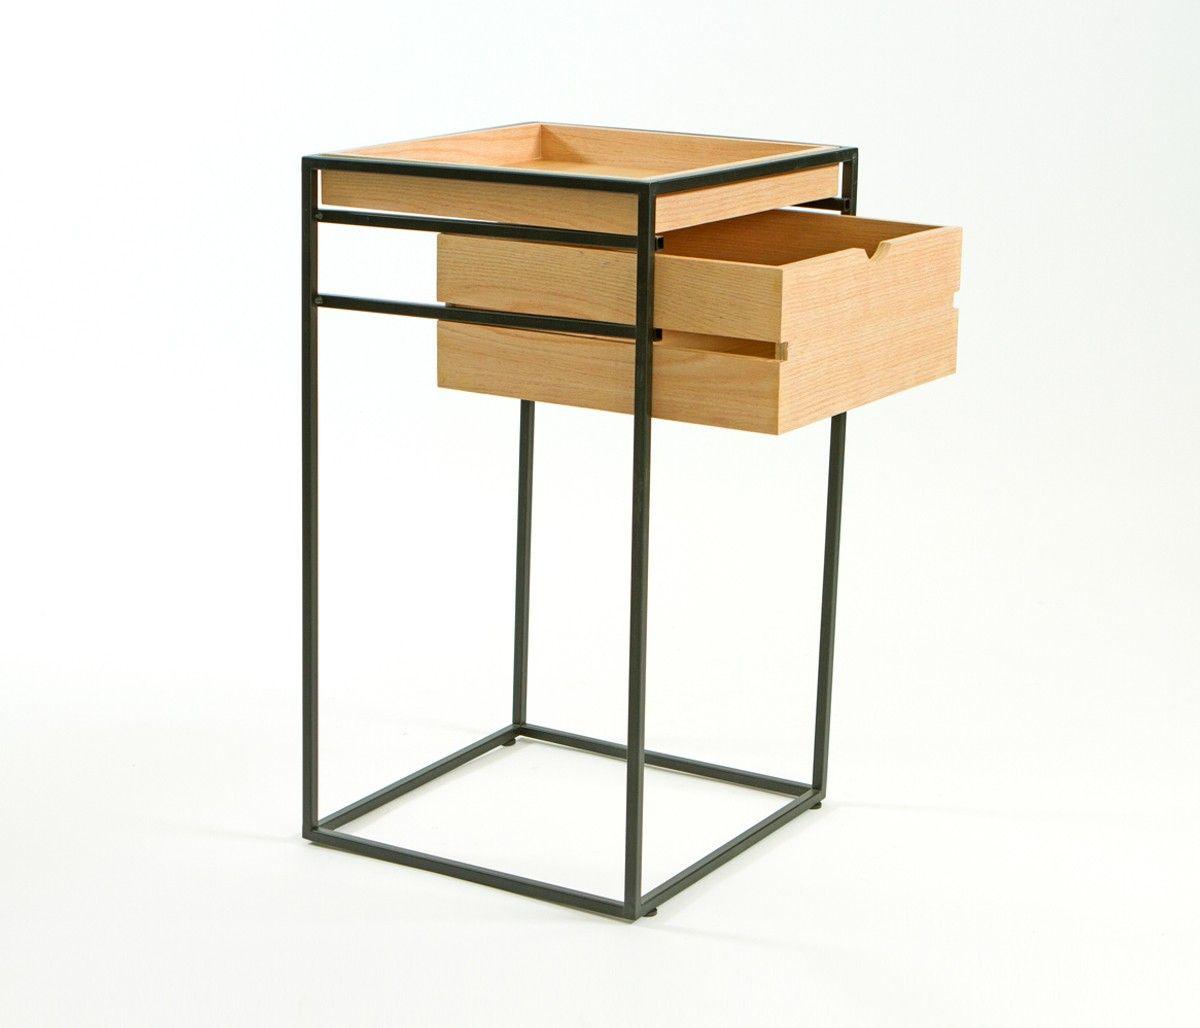 Bur Jerez Almacenar Muebles Dise O De Mobiliario